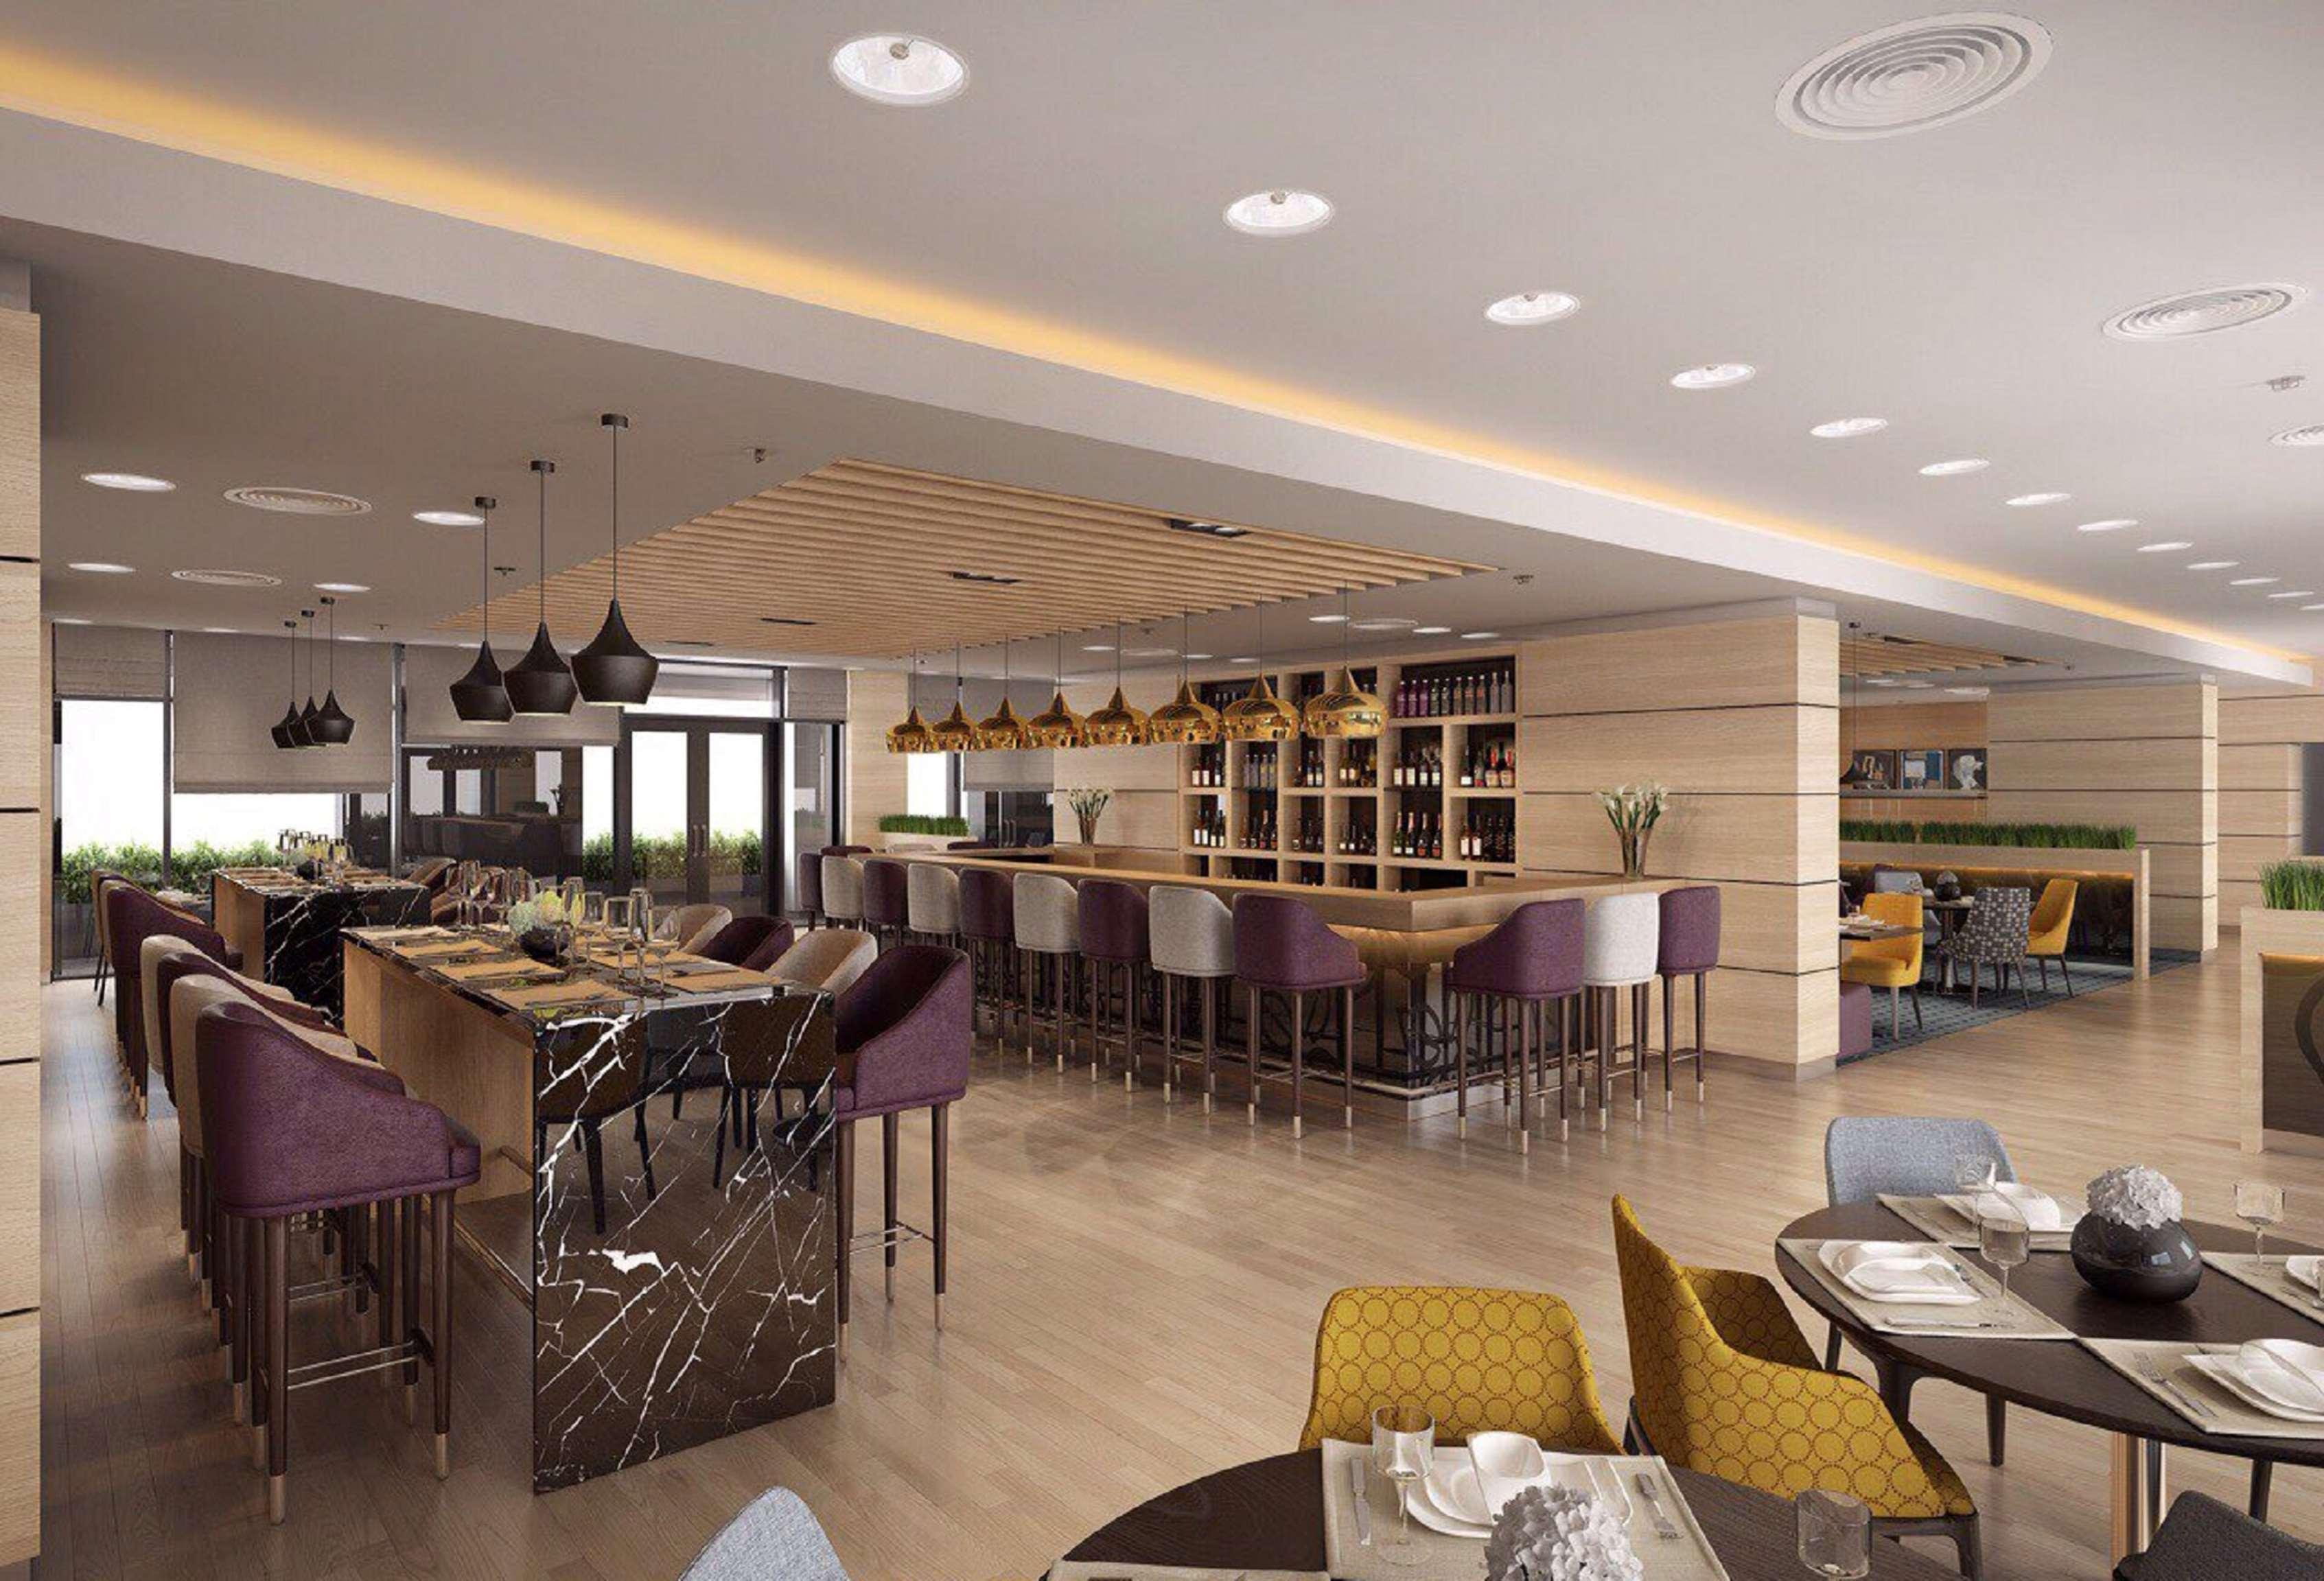 Best Western Premier Sofia Airport Hotel